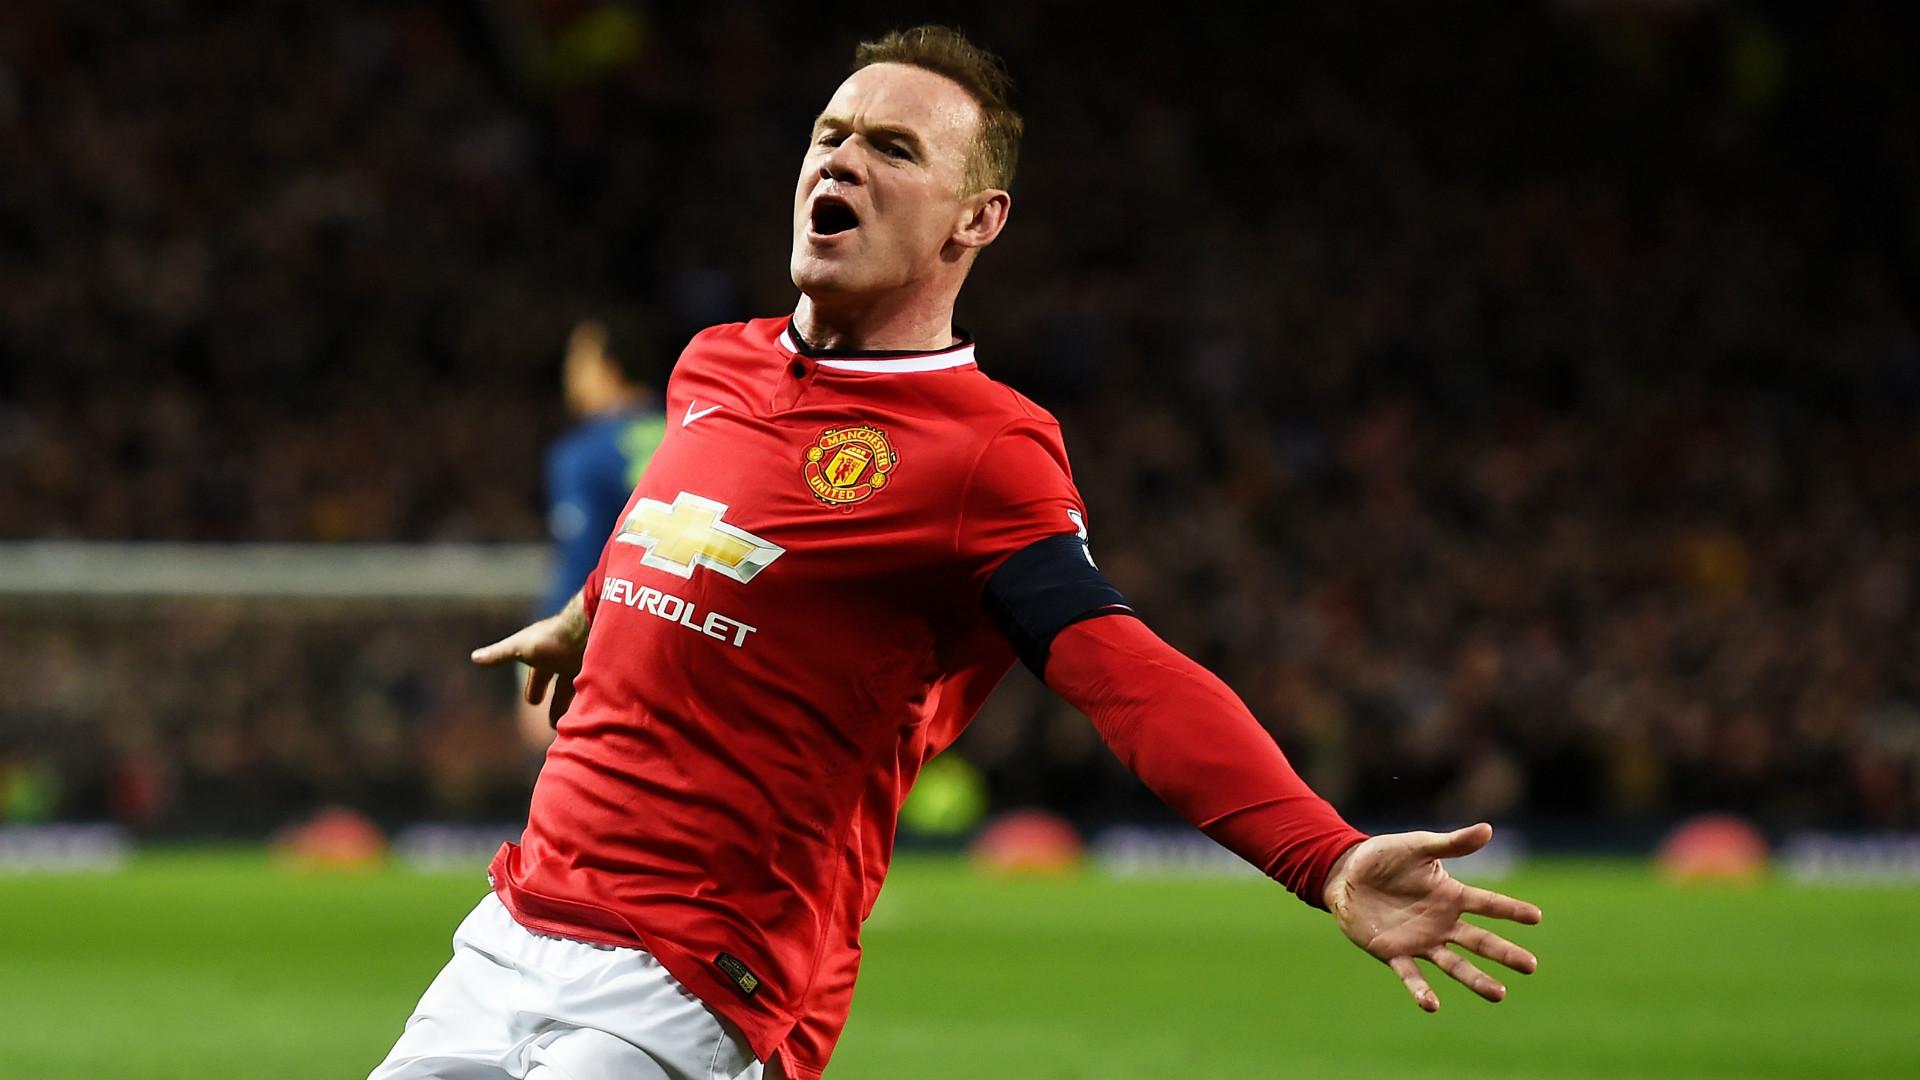 Wayne Rooney - ELLE Man - 2